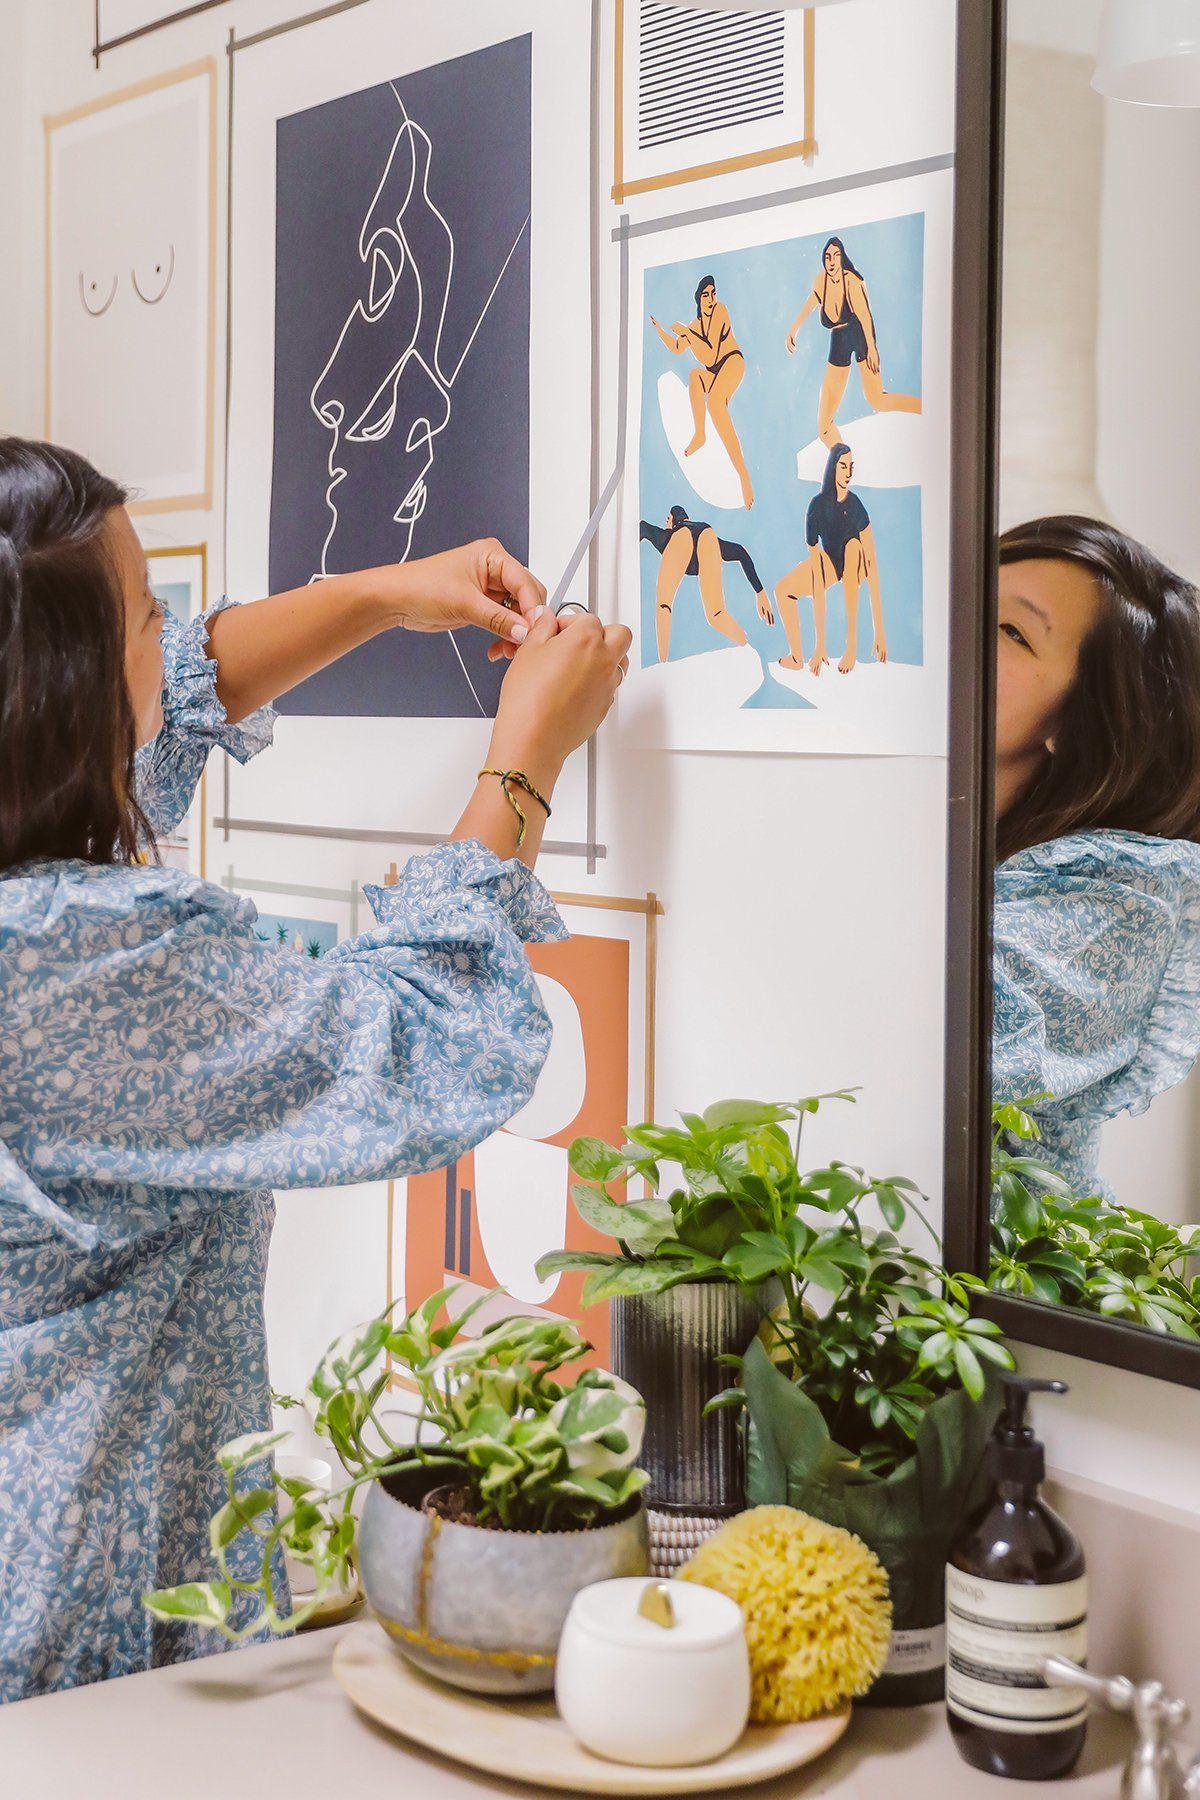 DIY Washi Tape Gallery Wall | Tape wall art, Diy washi ...